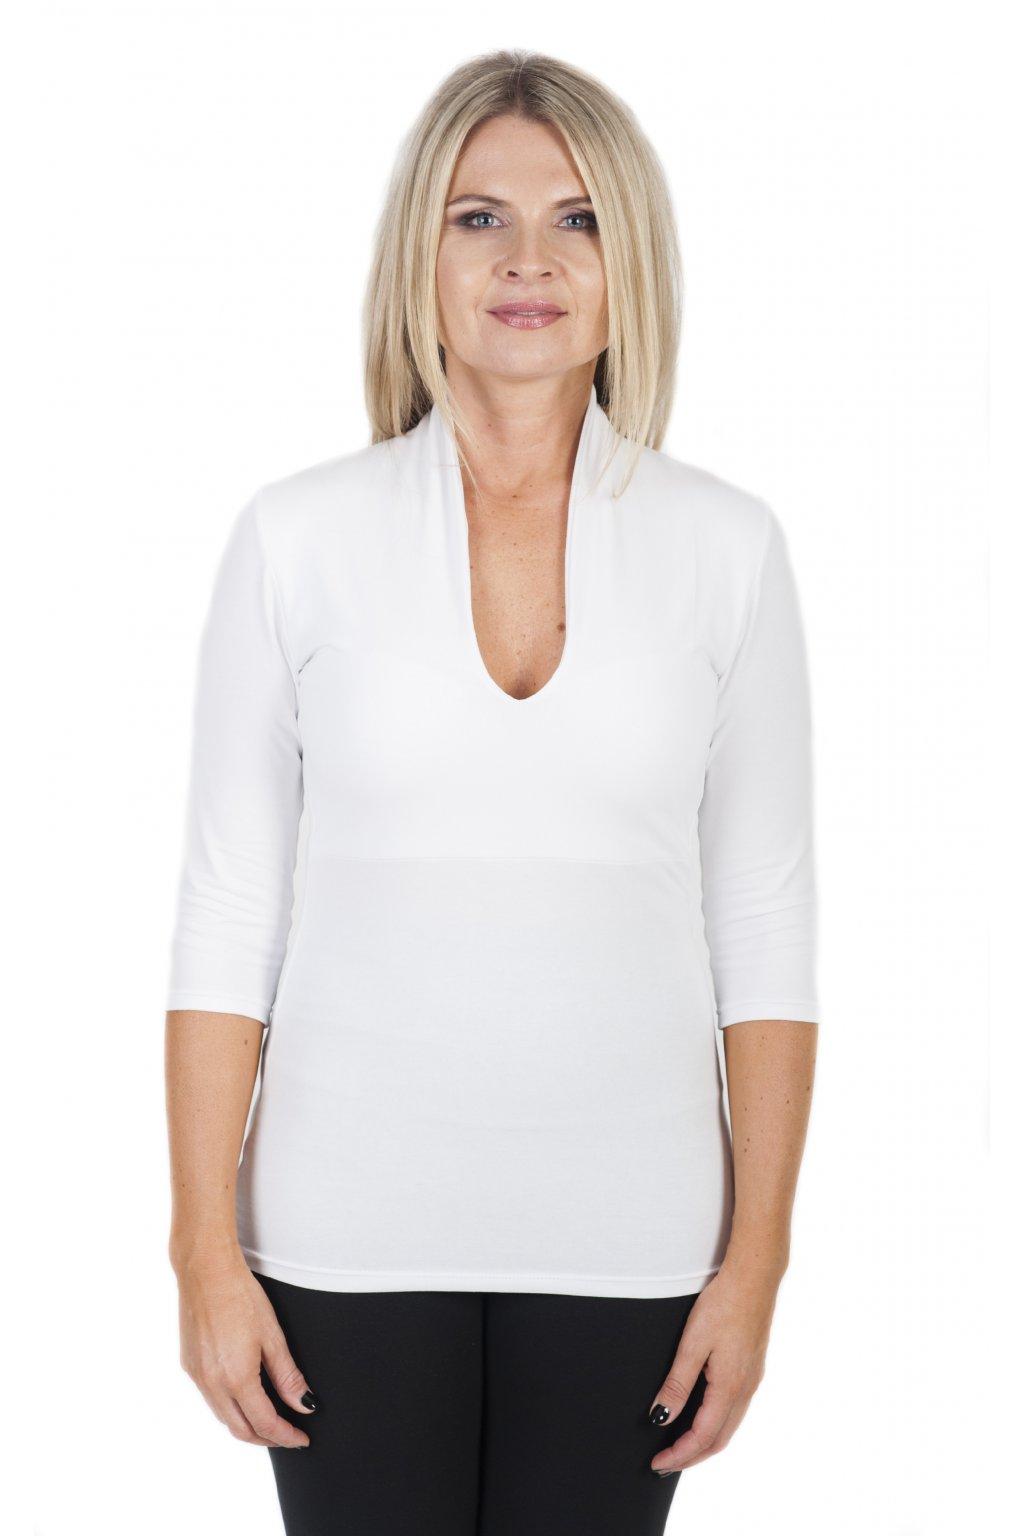 Japonské tričko Inari s 3/4 rukávem / Bílá